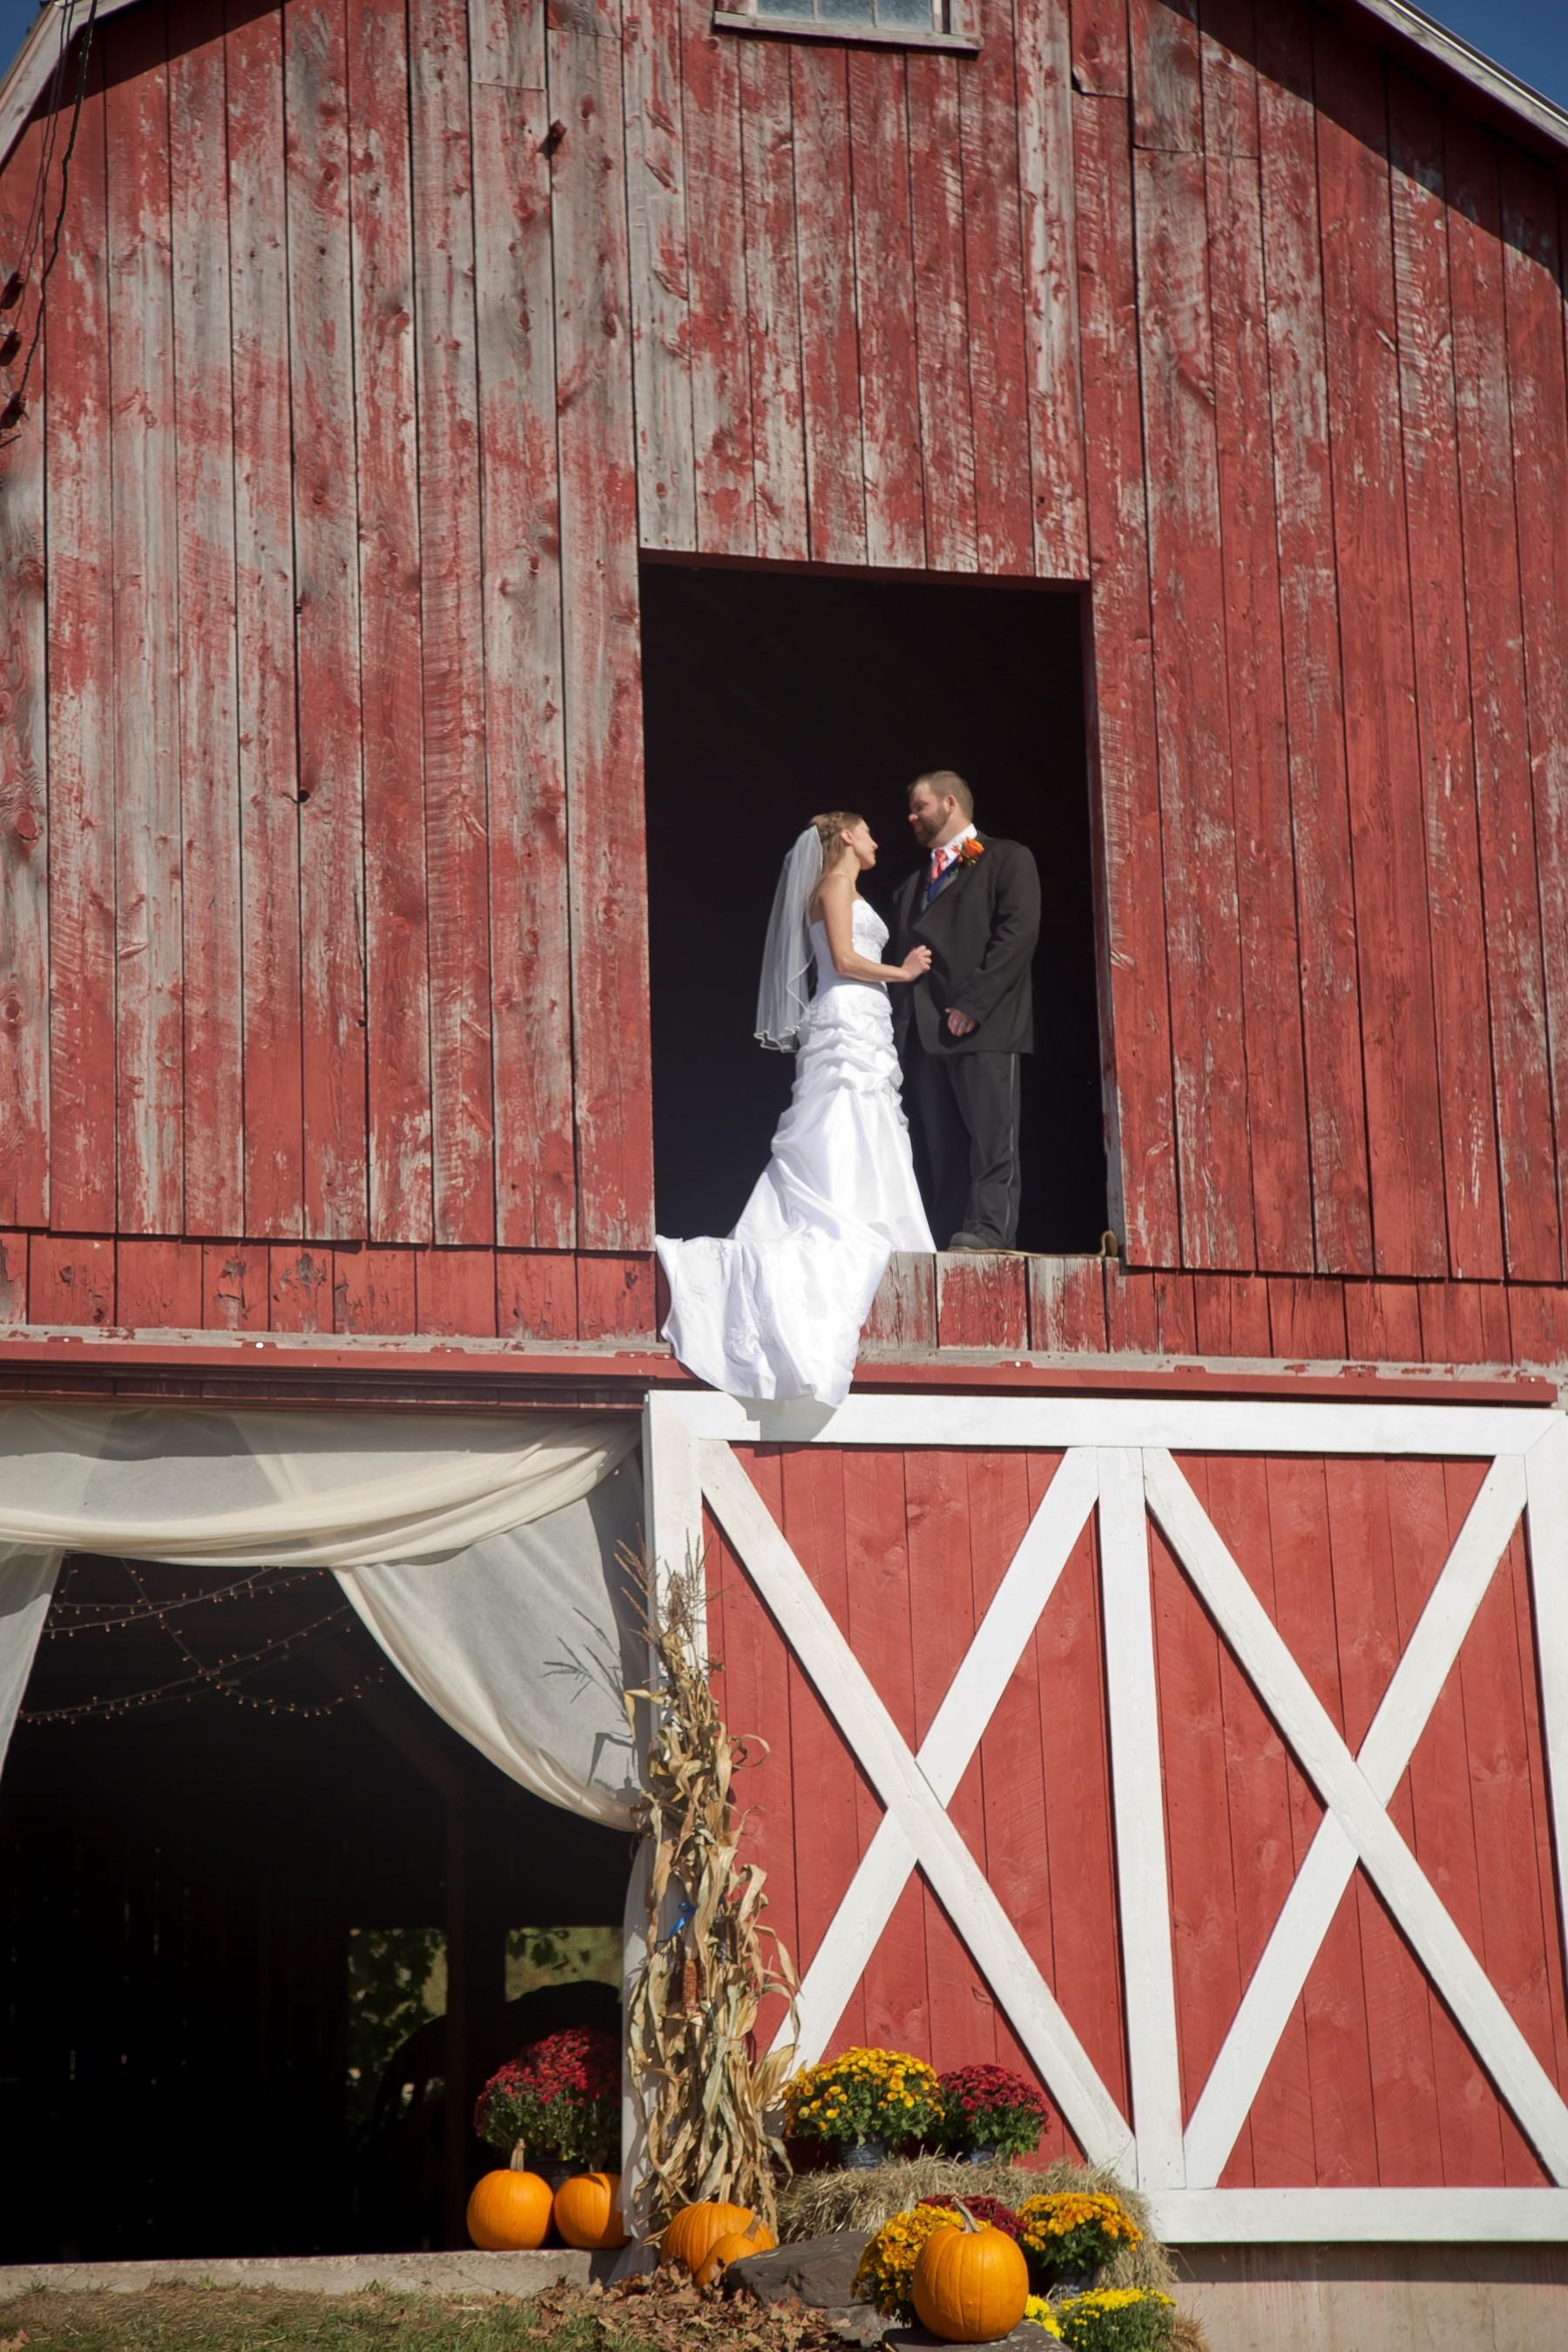 entry-14-samantha_crawford_all_occasion_photography_bride_groom_barn_formal.jpg